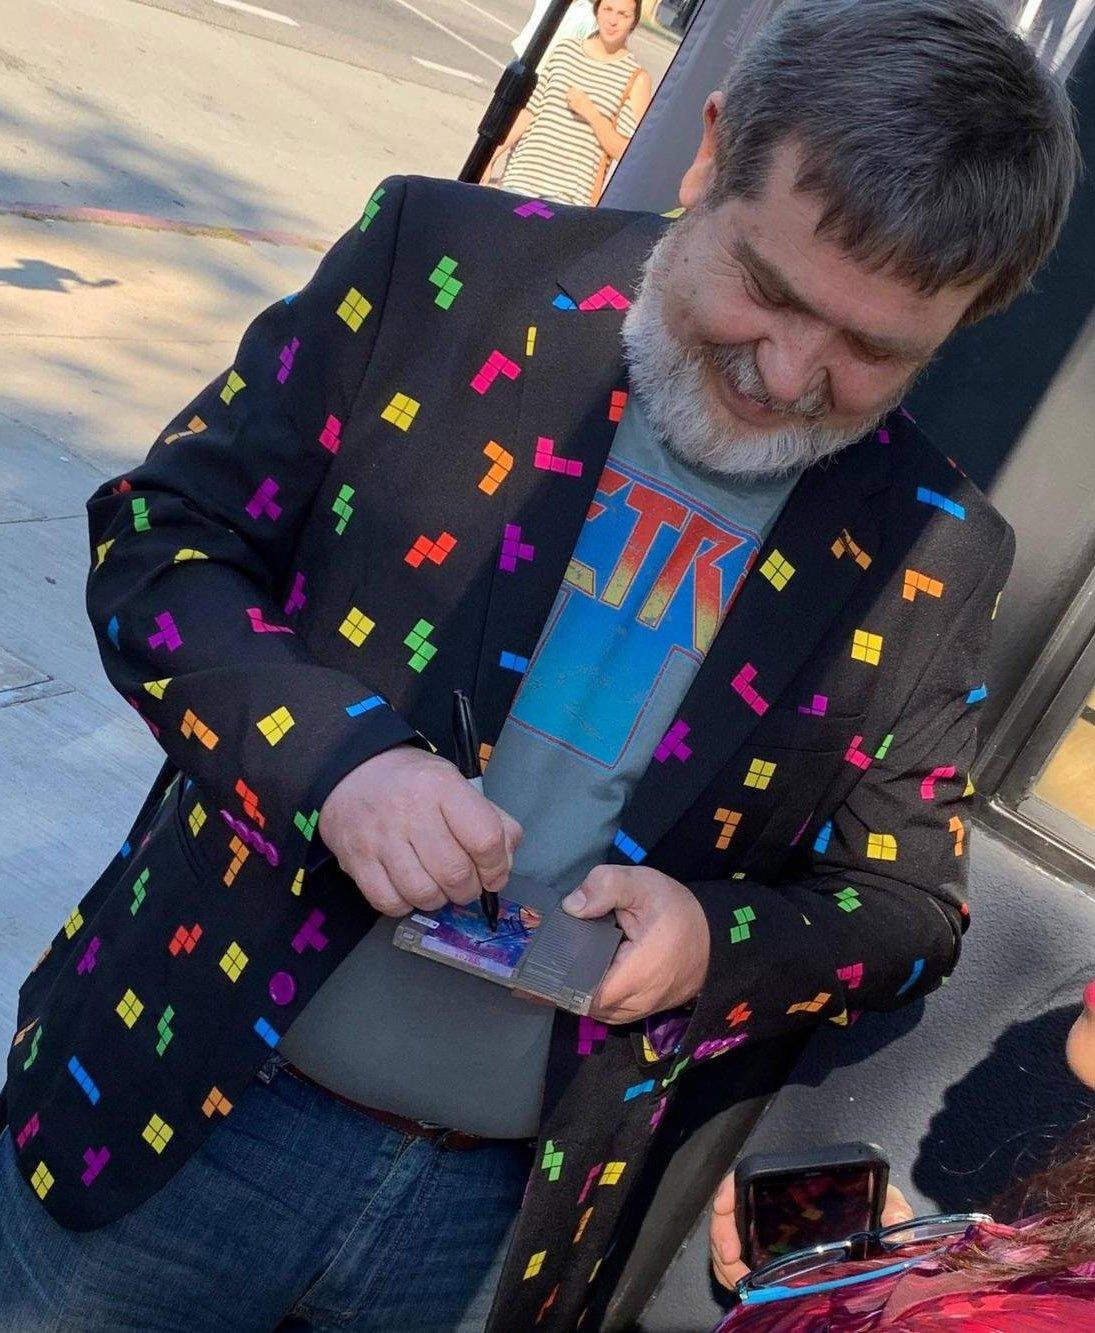 Alexey Pajitnov Tetris